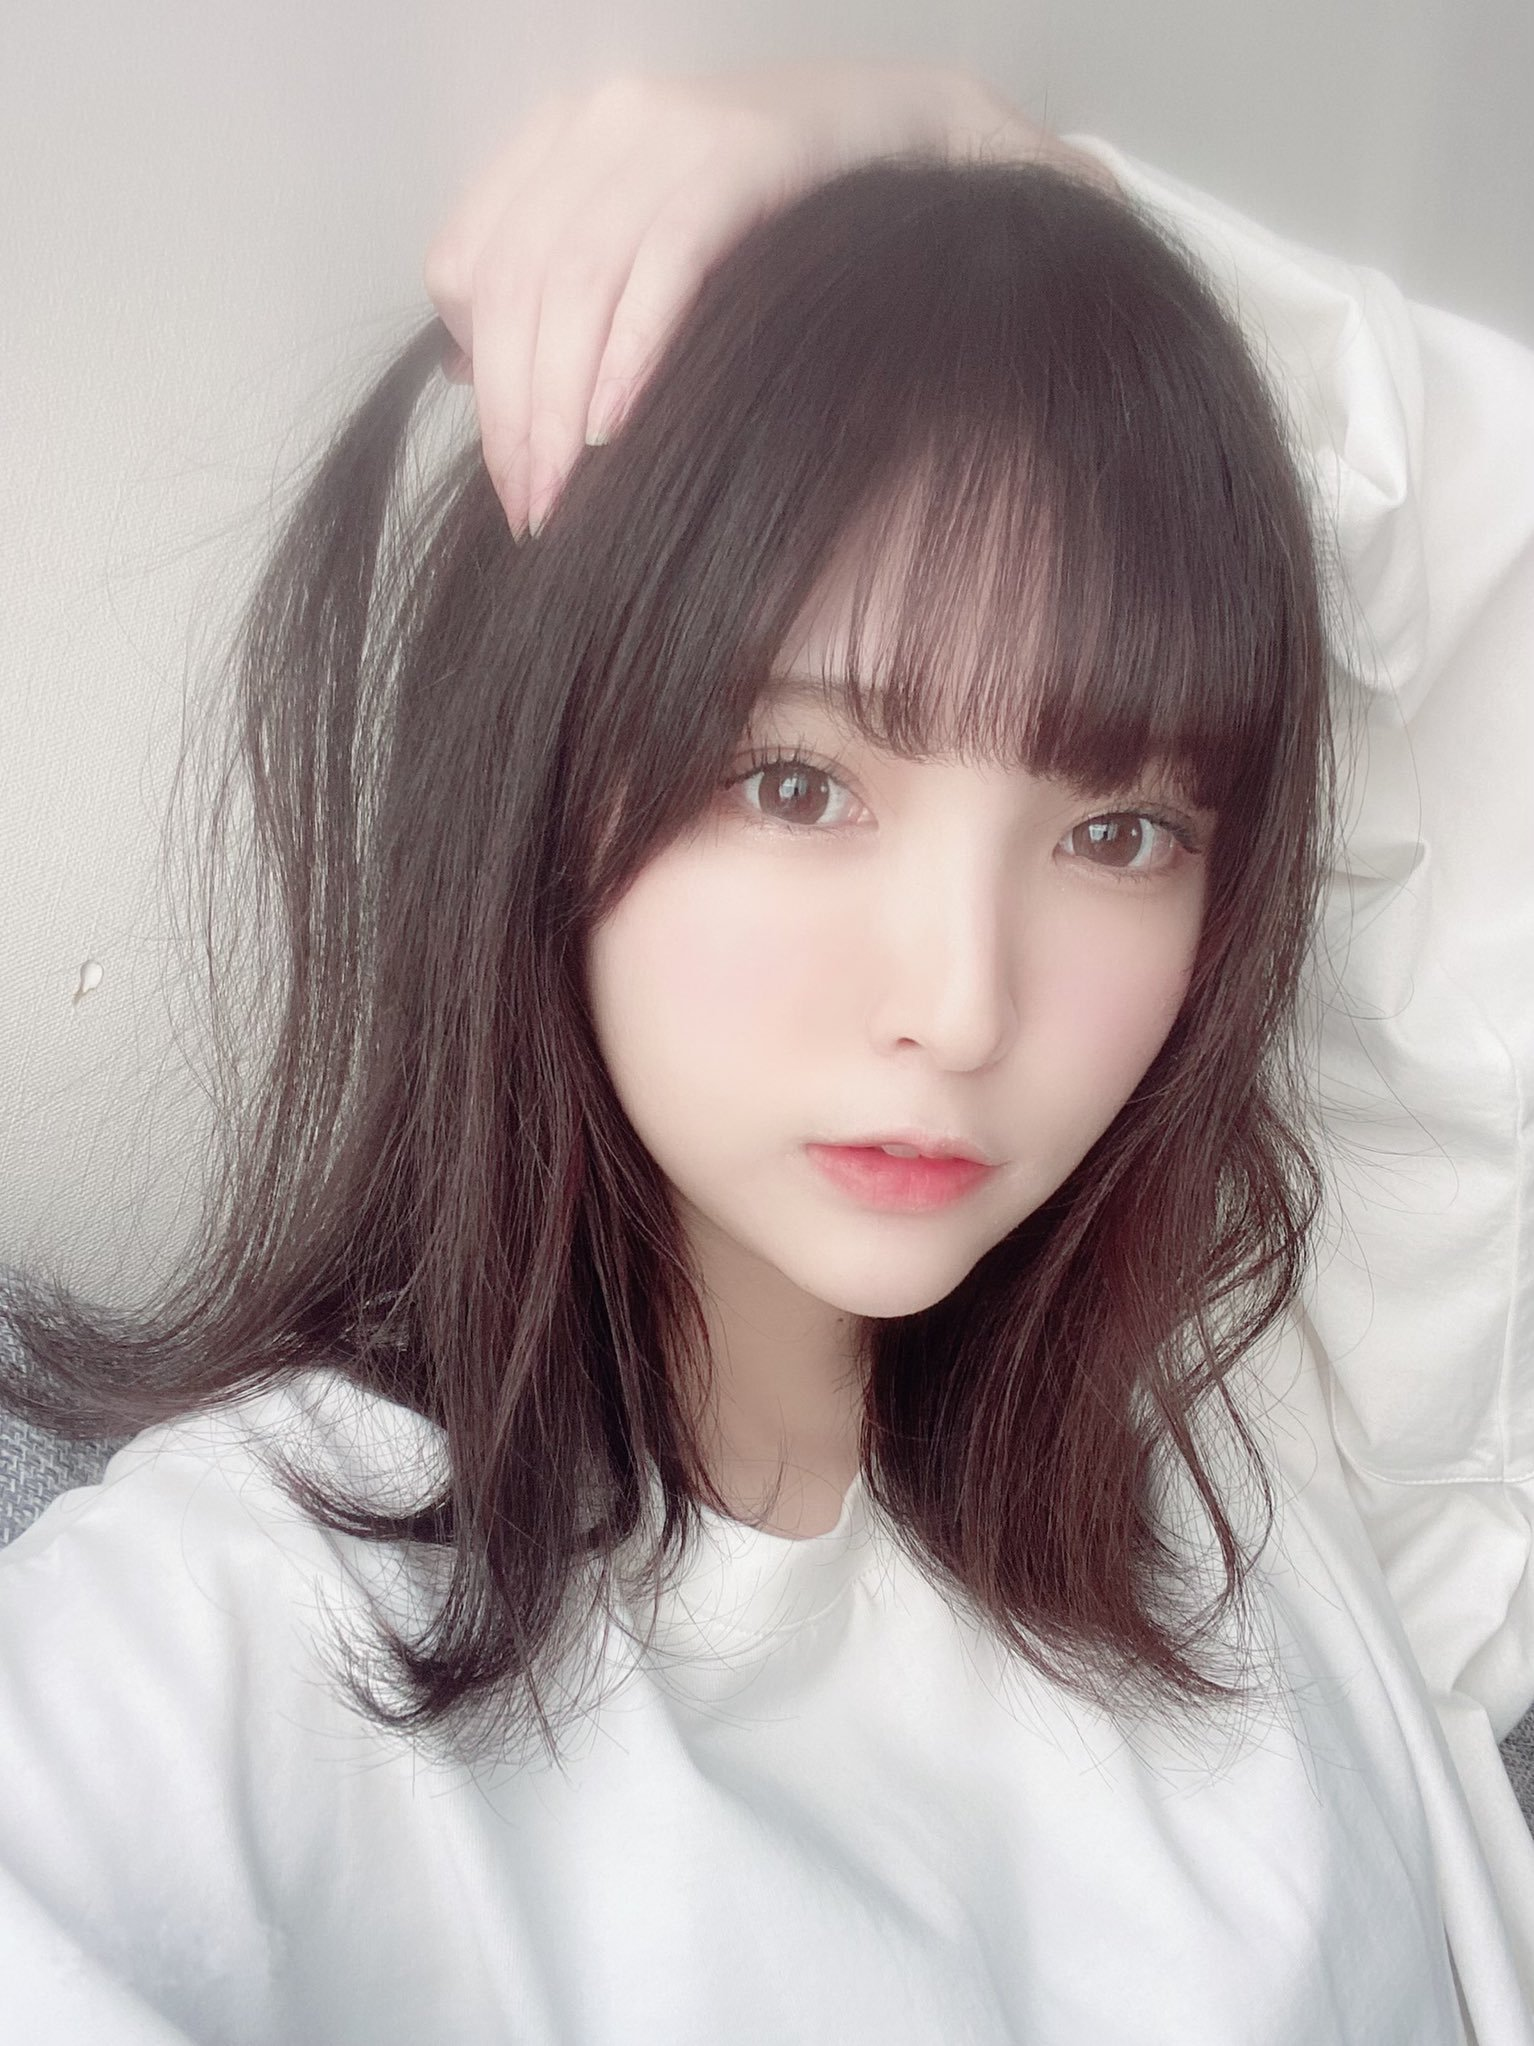 naosuzumoto 1260192808536649729_p0